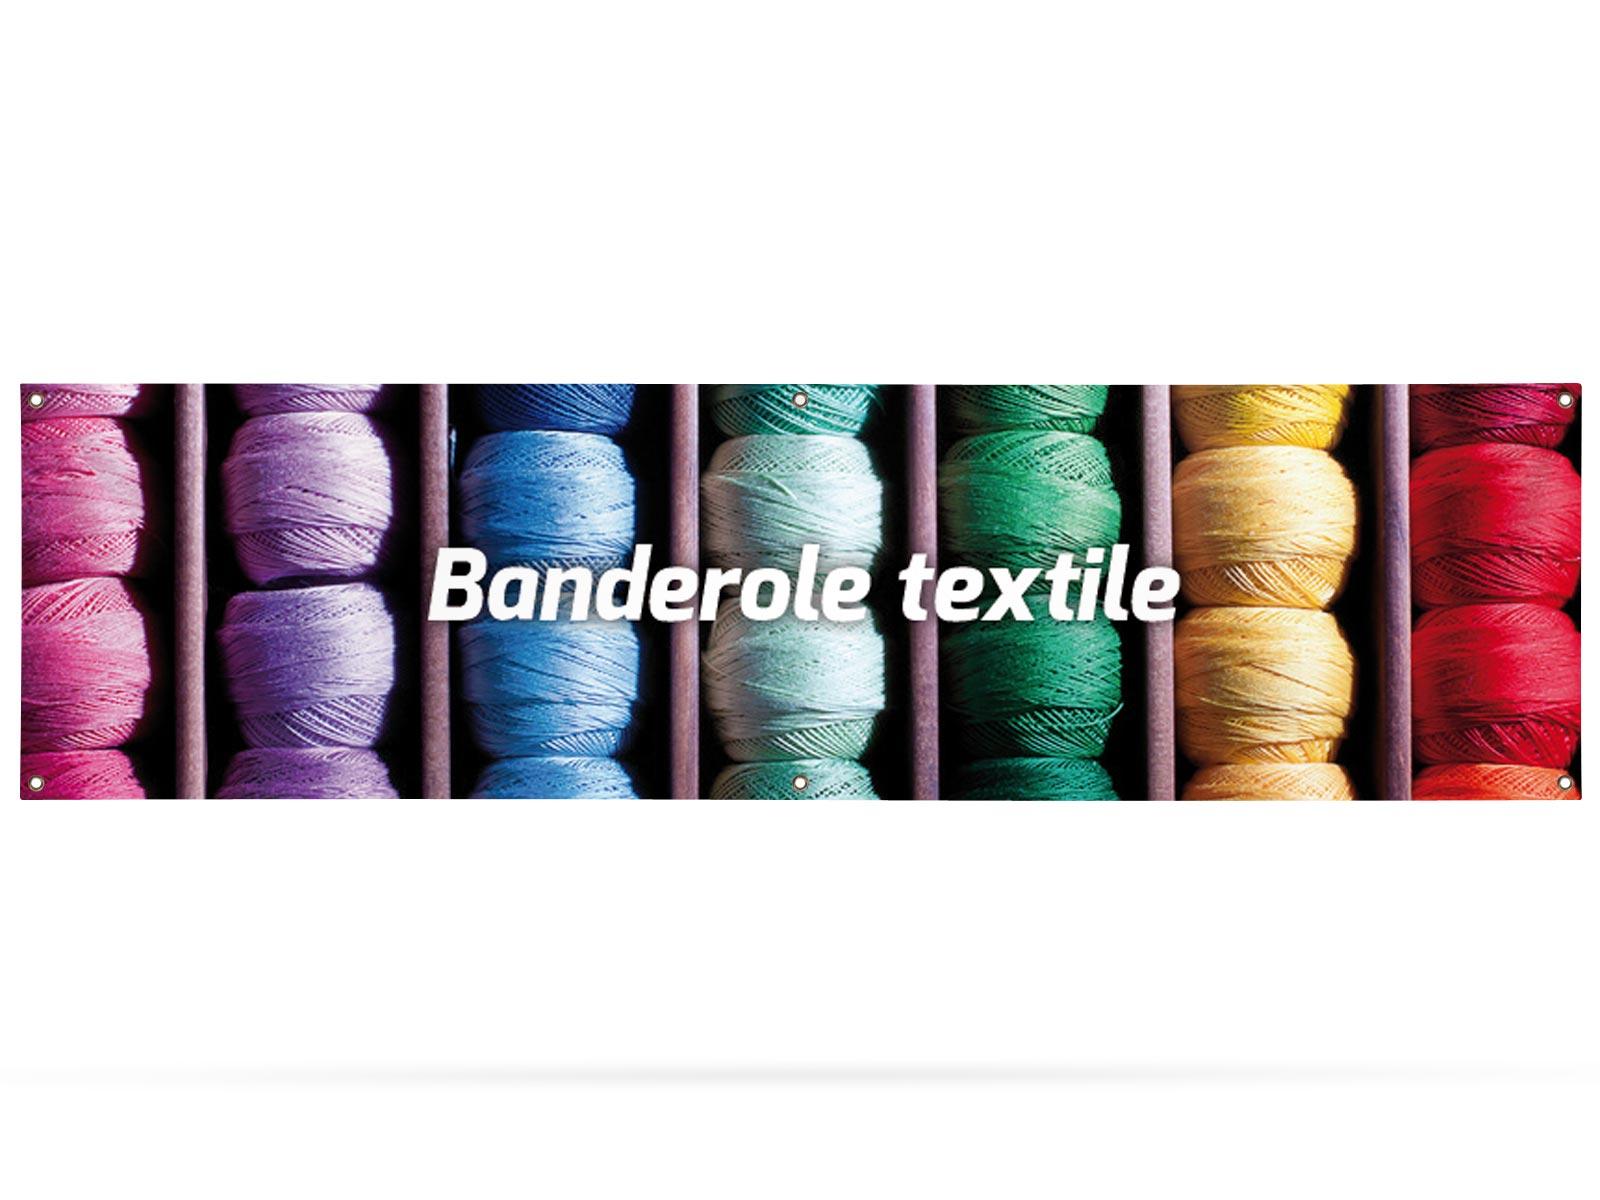 banderole textile 300 x 80 cm banderole expoz. Black Bedroom Furniture Sets. Home Design Ideas